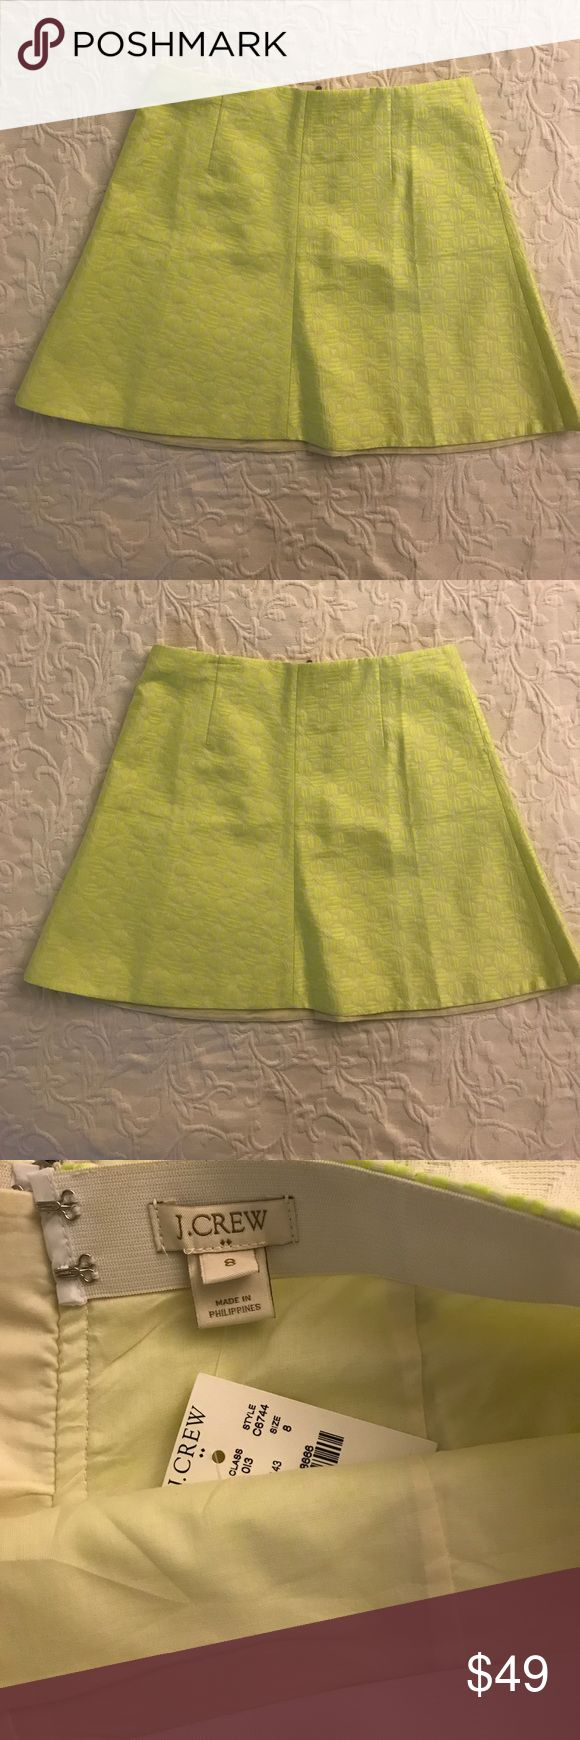 "NWT J.Crew women's neon yellow skirt size 8 NEW J.Crew women's neon yellow skirt . Size 8. 45% cotton, 38% polyester, 16% nylon. Lining 100% cotton. Measurements  Waist 31"" Length 17"" J.Crew Skirts Mini"